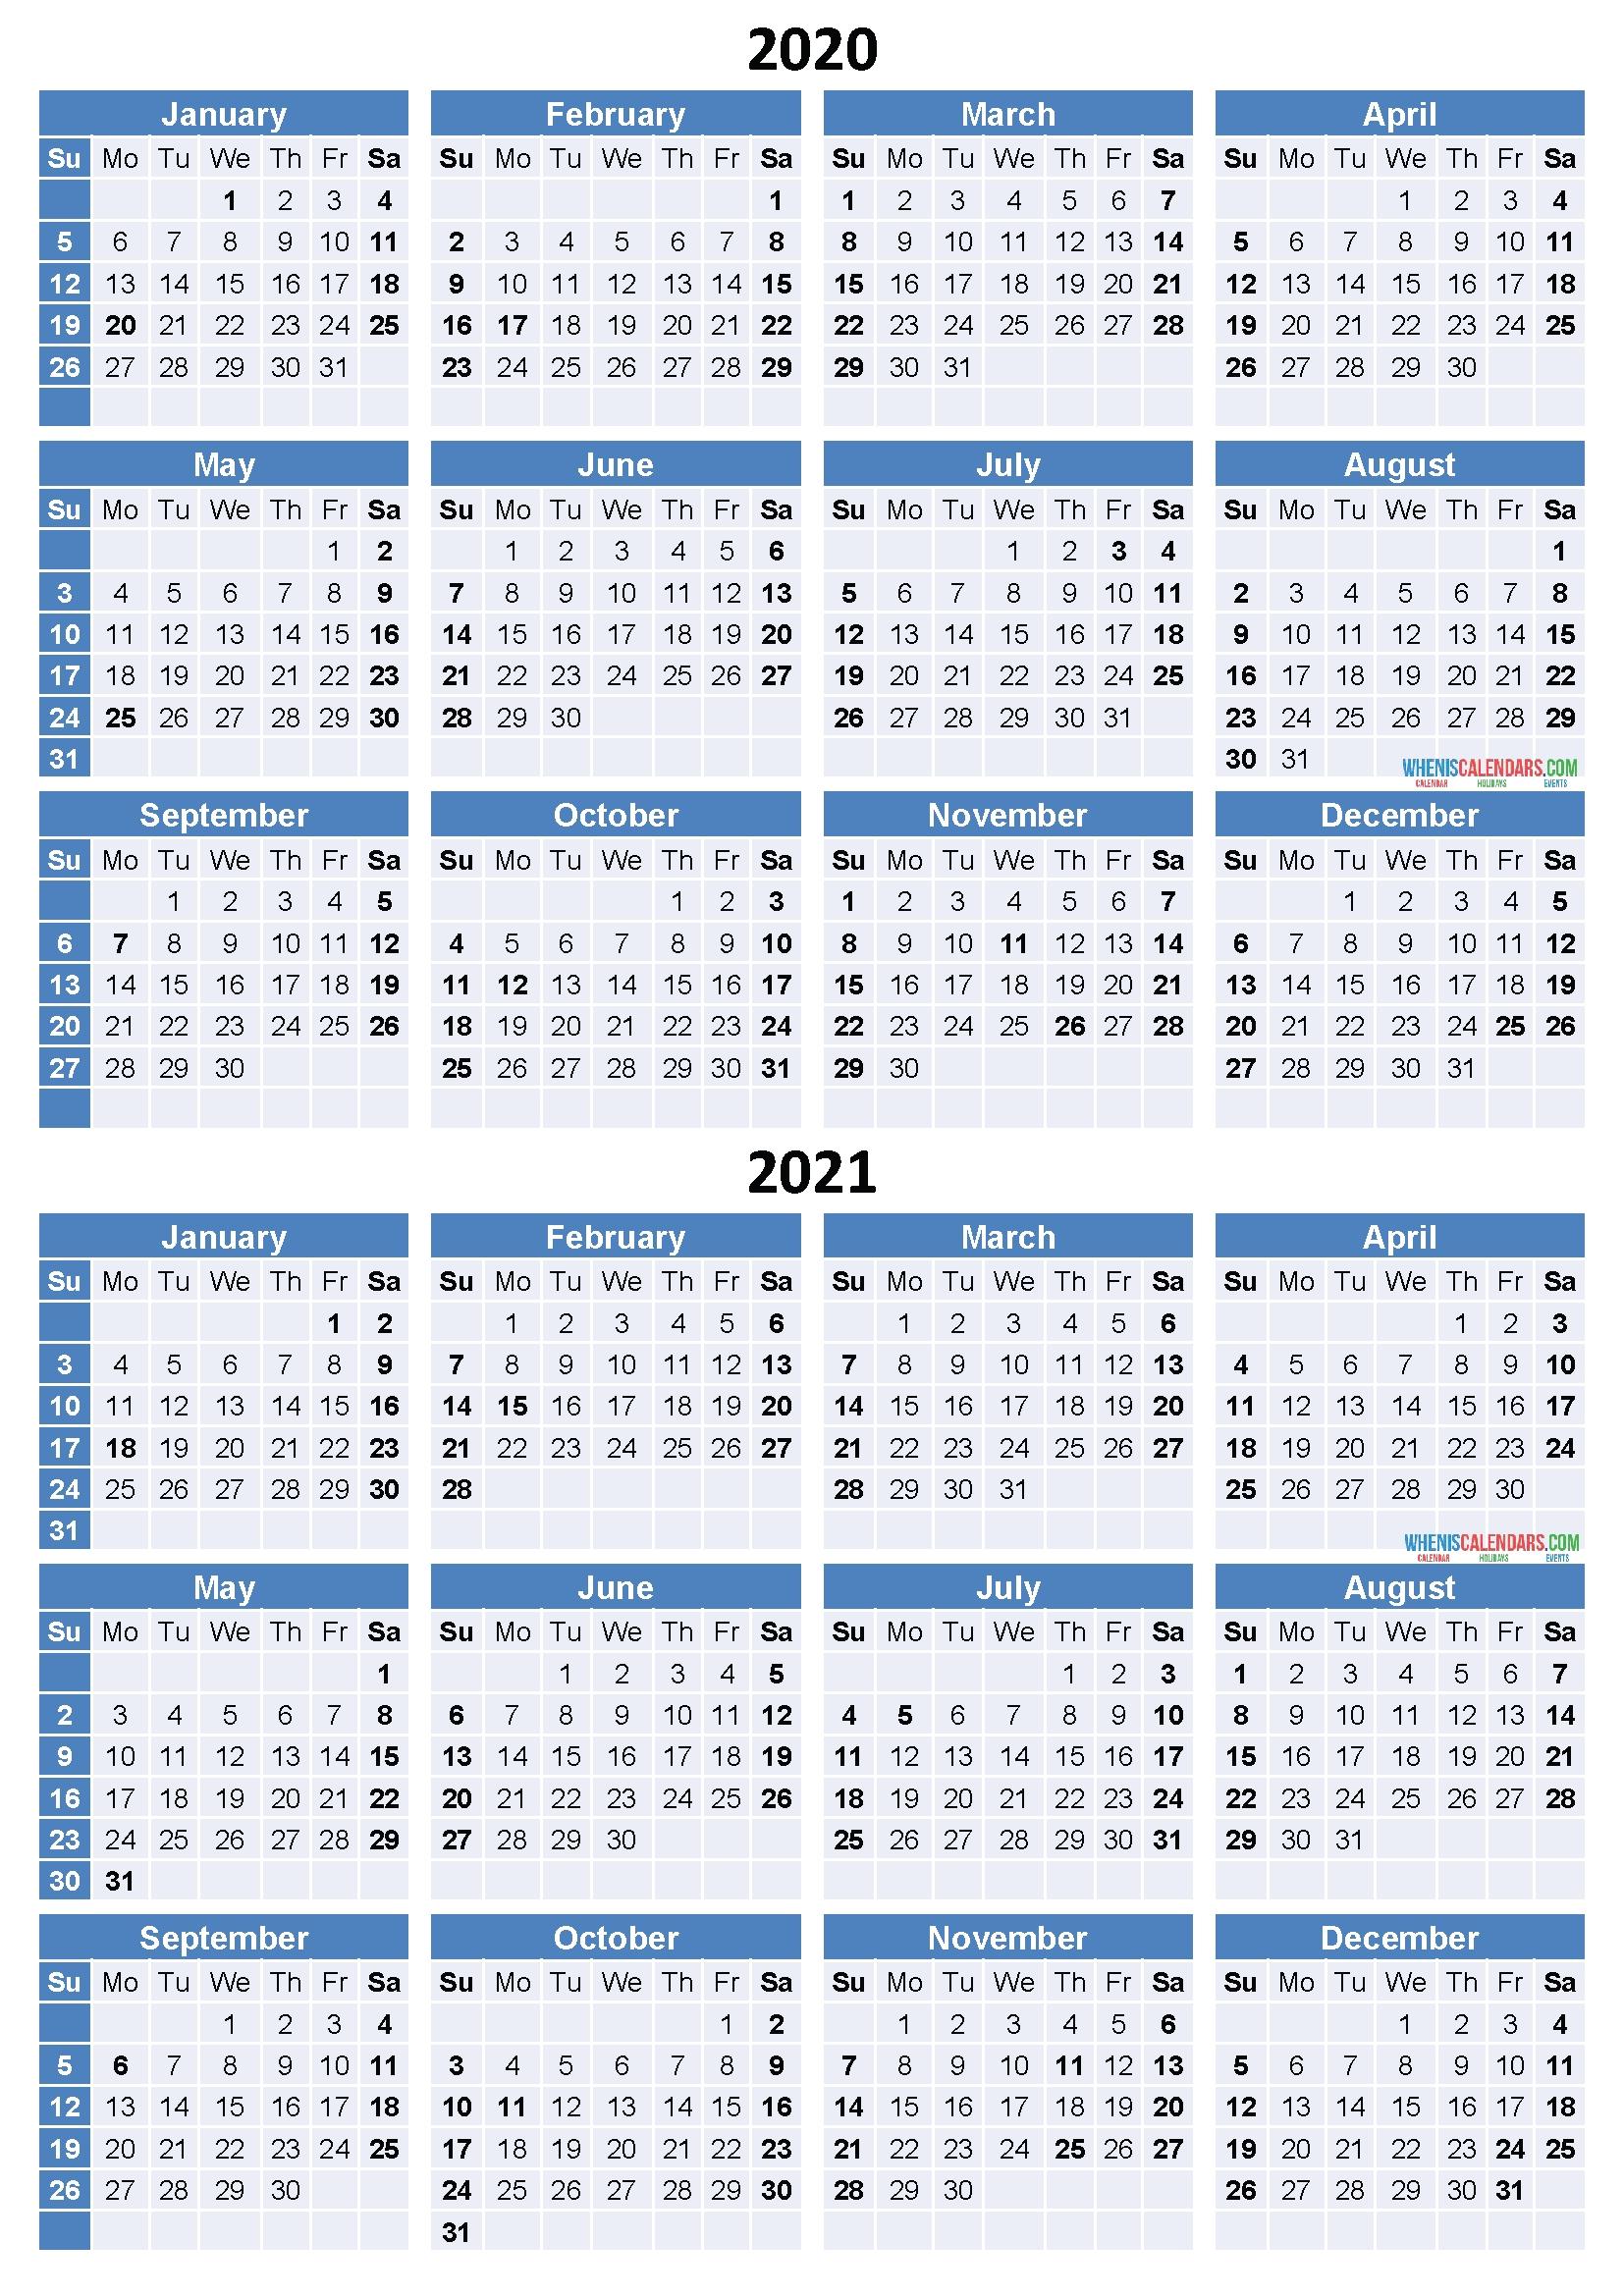 Printable 2 Year Calendar 2020 2021 - Calendar Printable Free